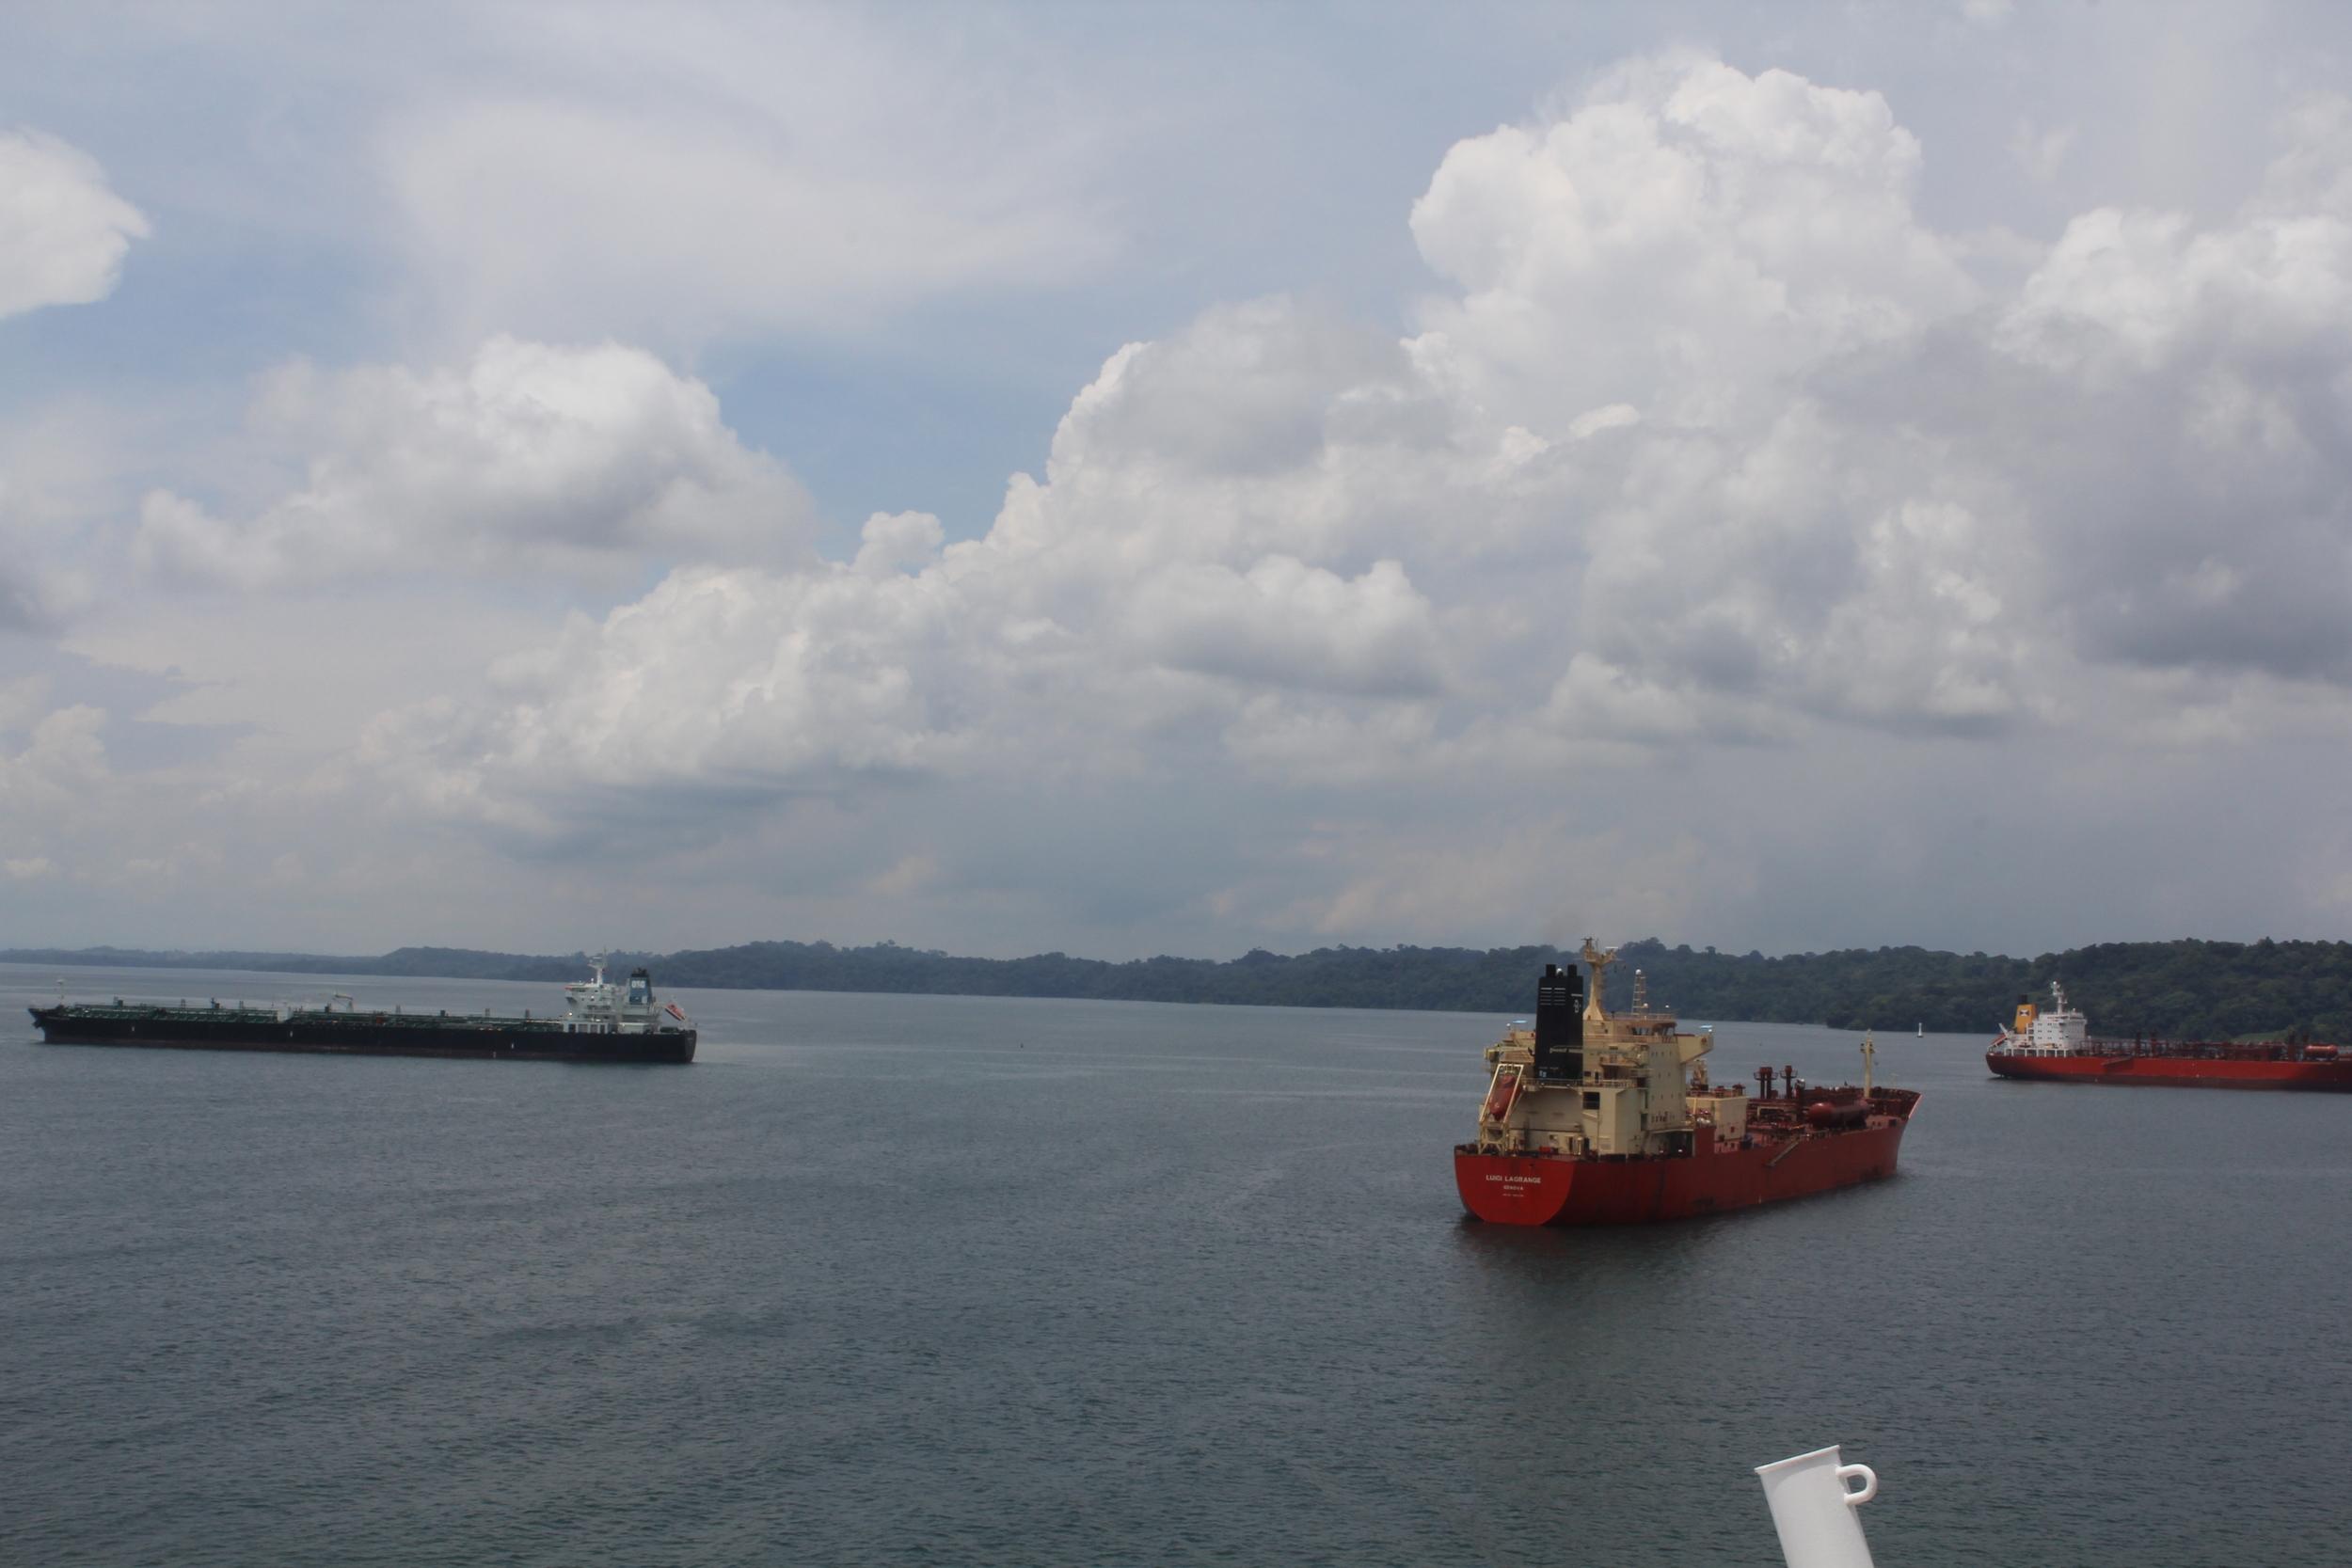 Ships waiting their turn to go through the locks into the Caribbean Sea.